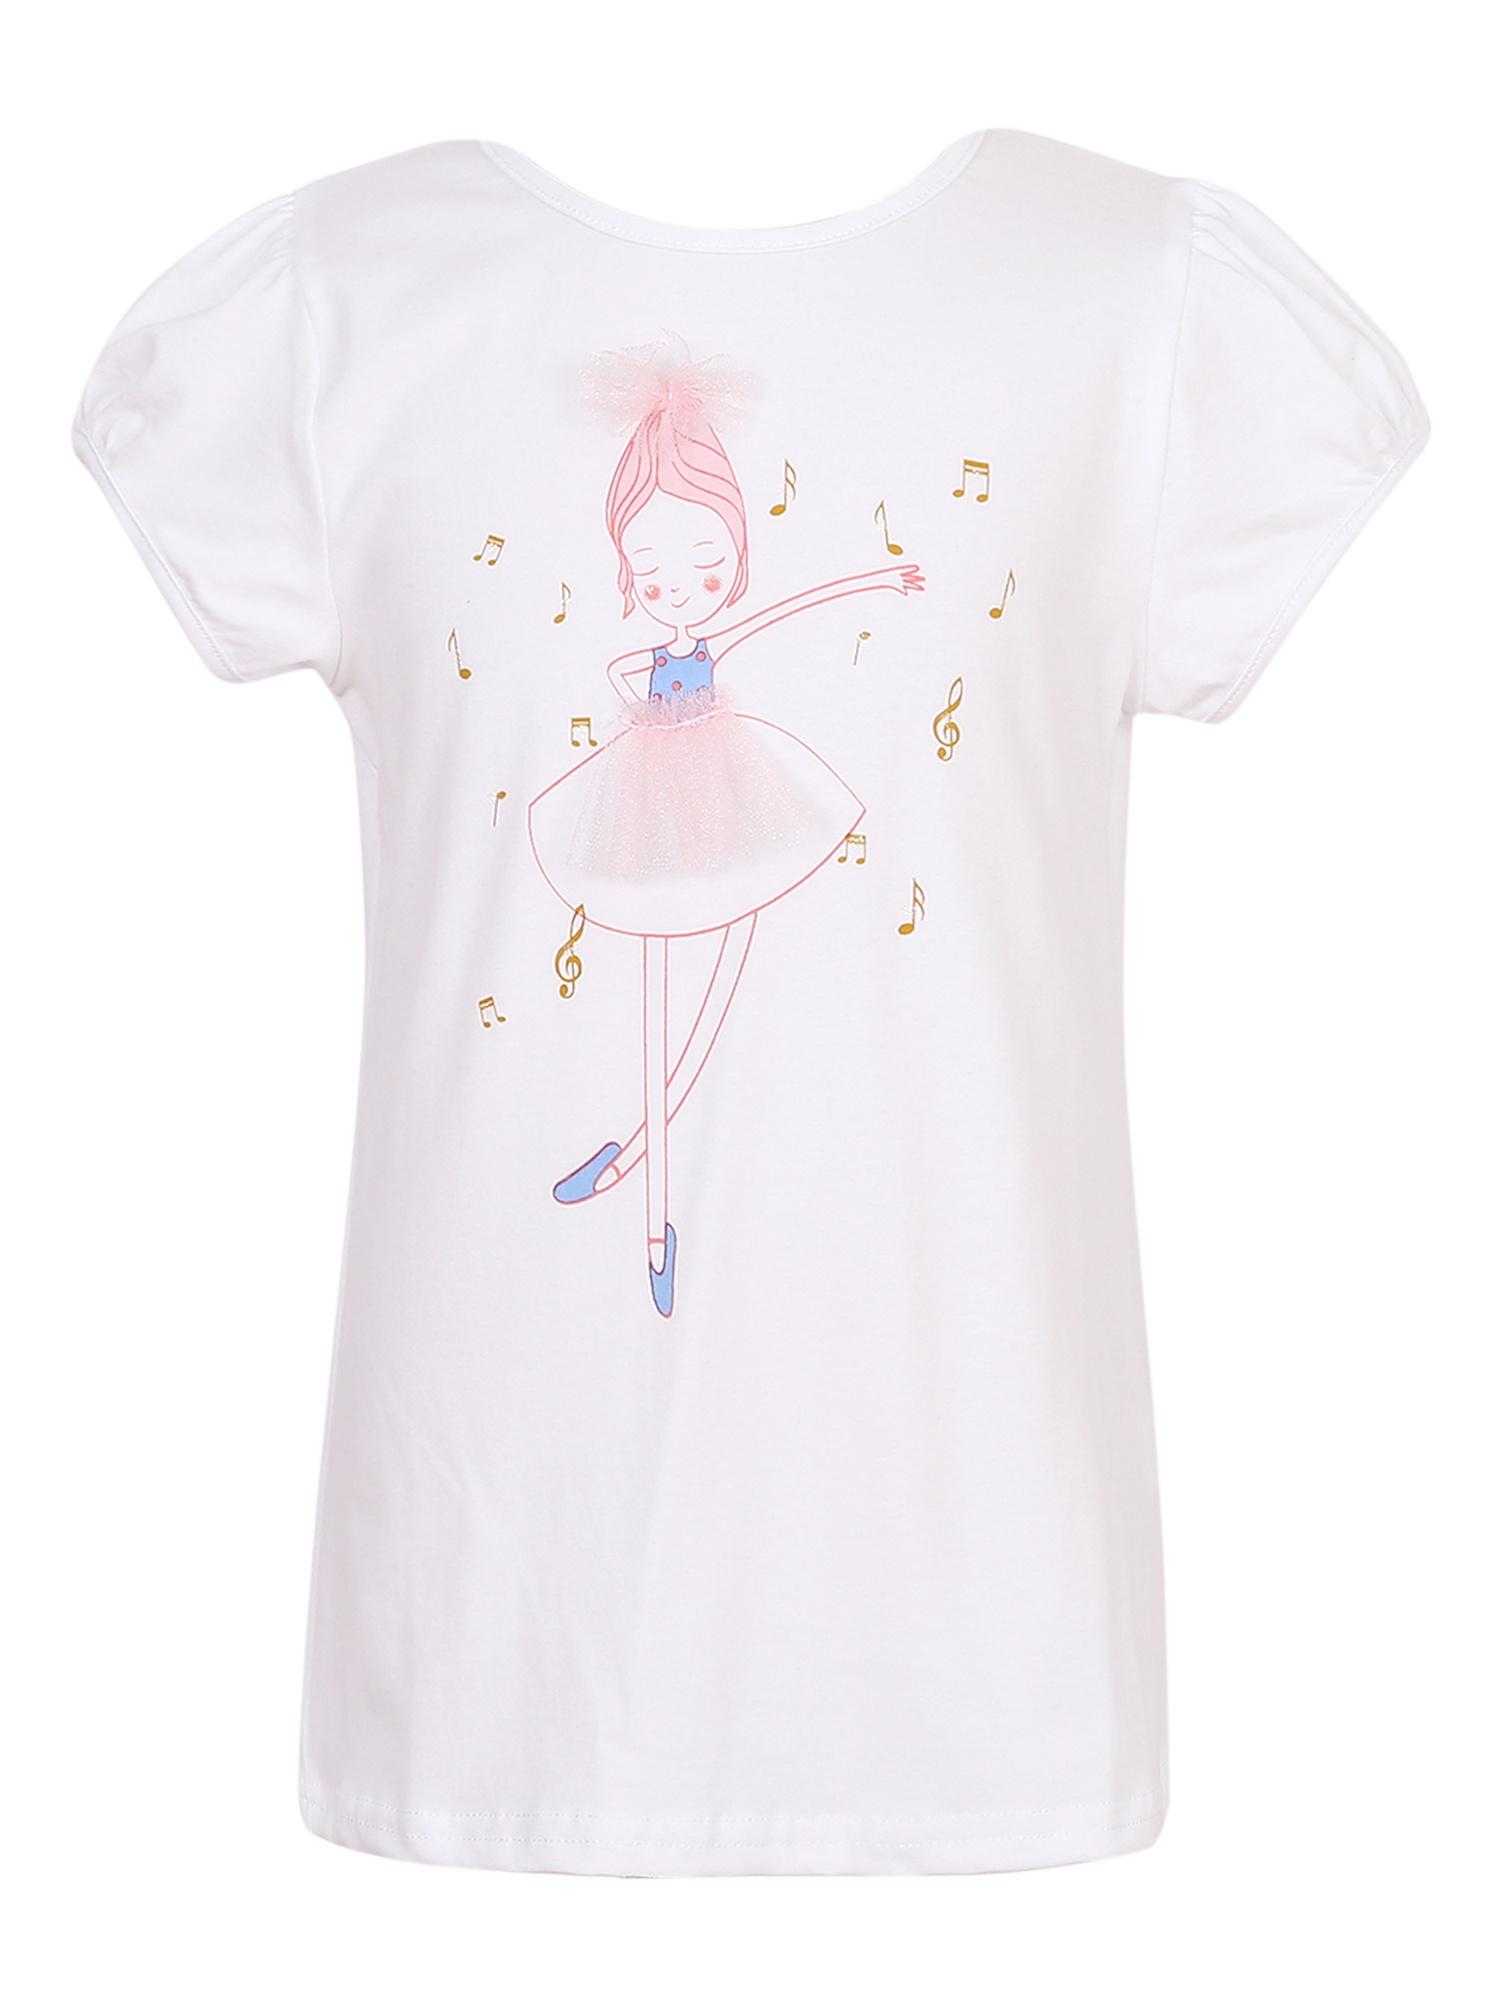 Richie House Girls' Cotton Knit T-Shirt with Dancing Girls RH2419